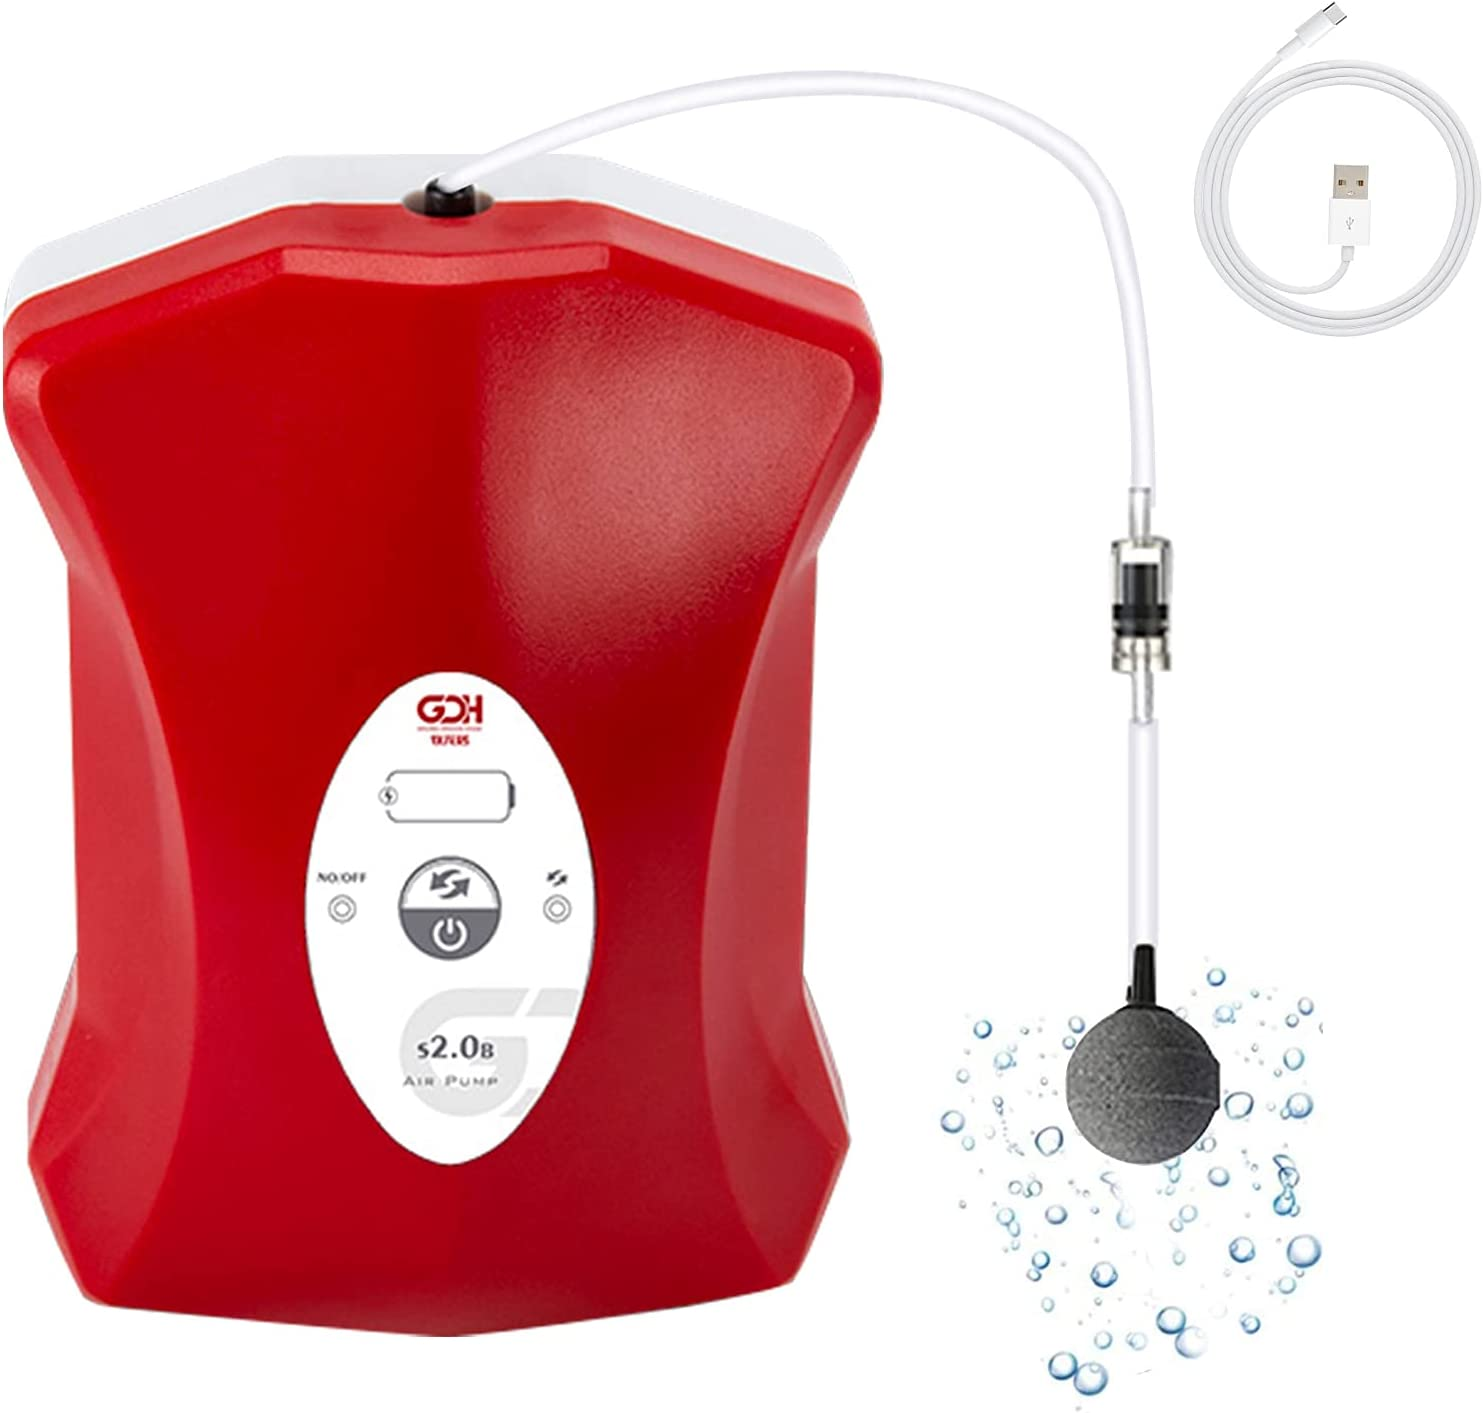 Kaiyopop Aquarium Air Pump Rechargeable Max 52% OFF Fish and Tank NEW Portable